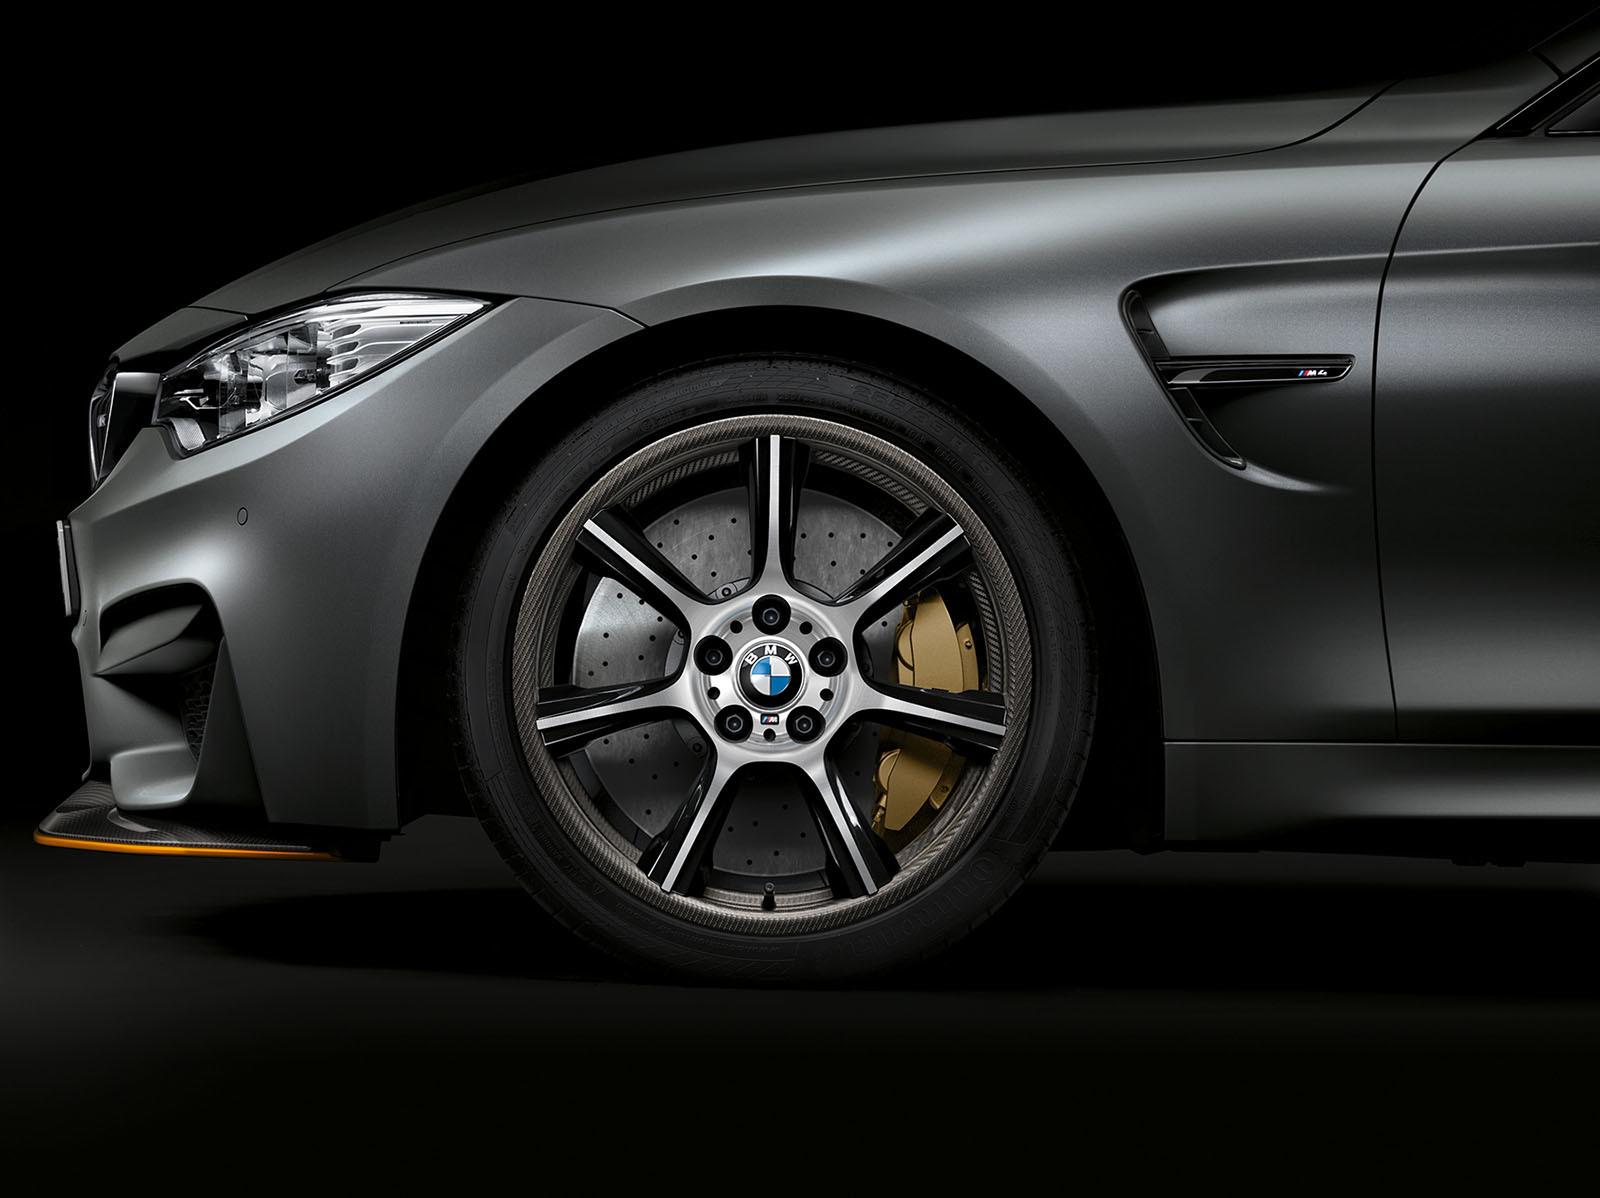 Foto de BMW M4 GTS rines de fibra de carbono (1/3)